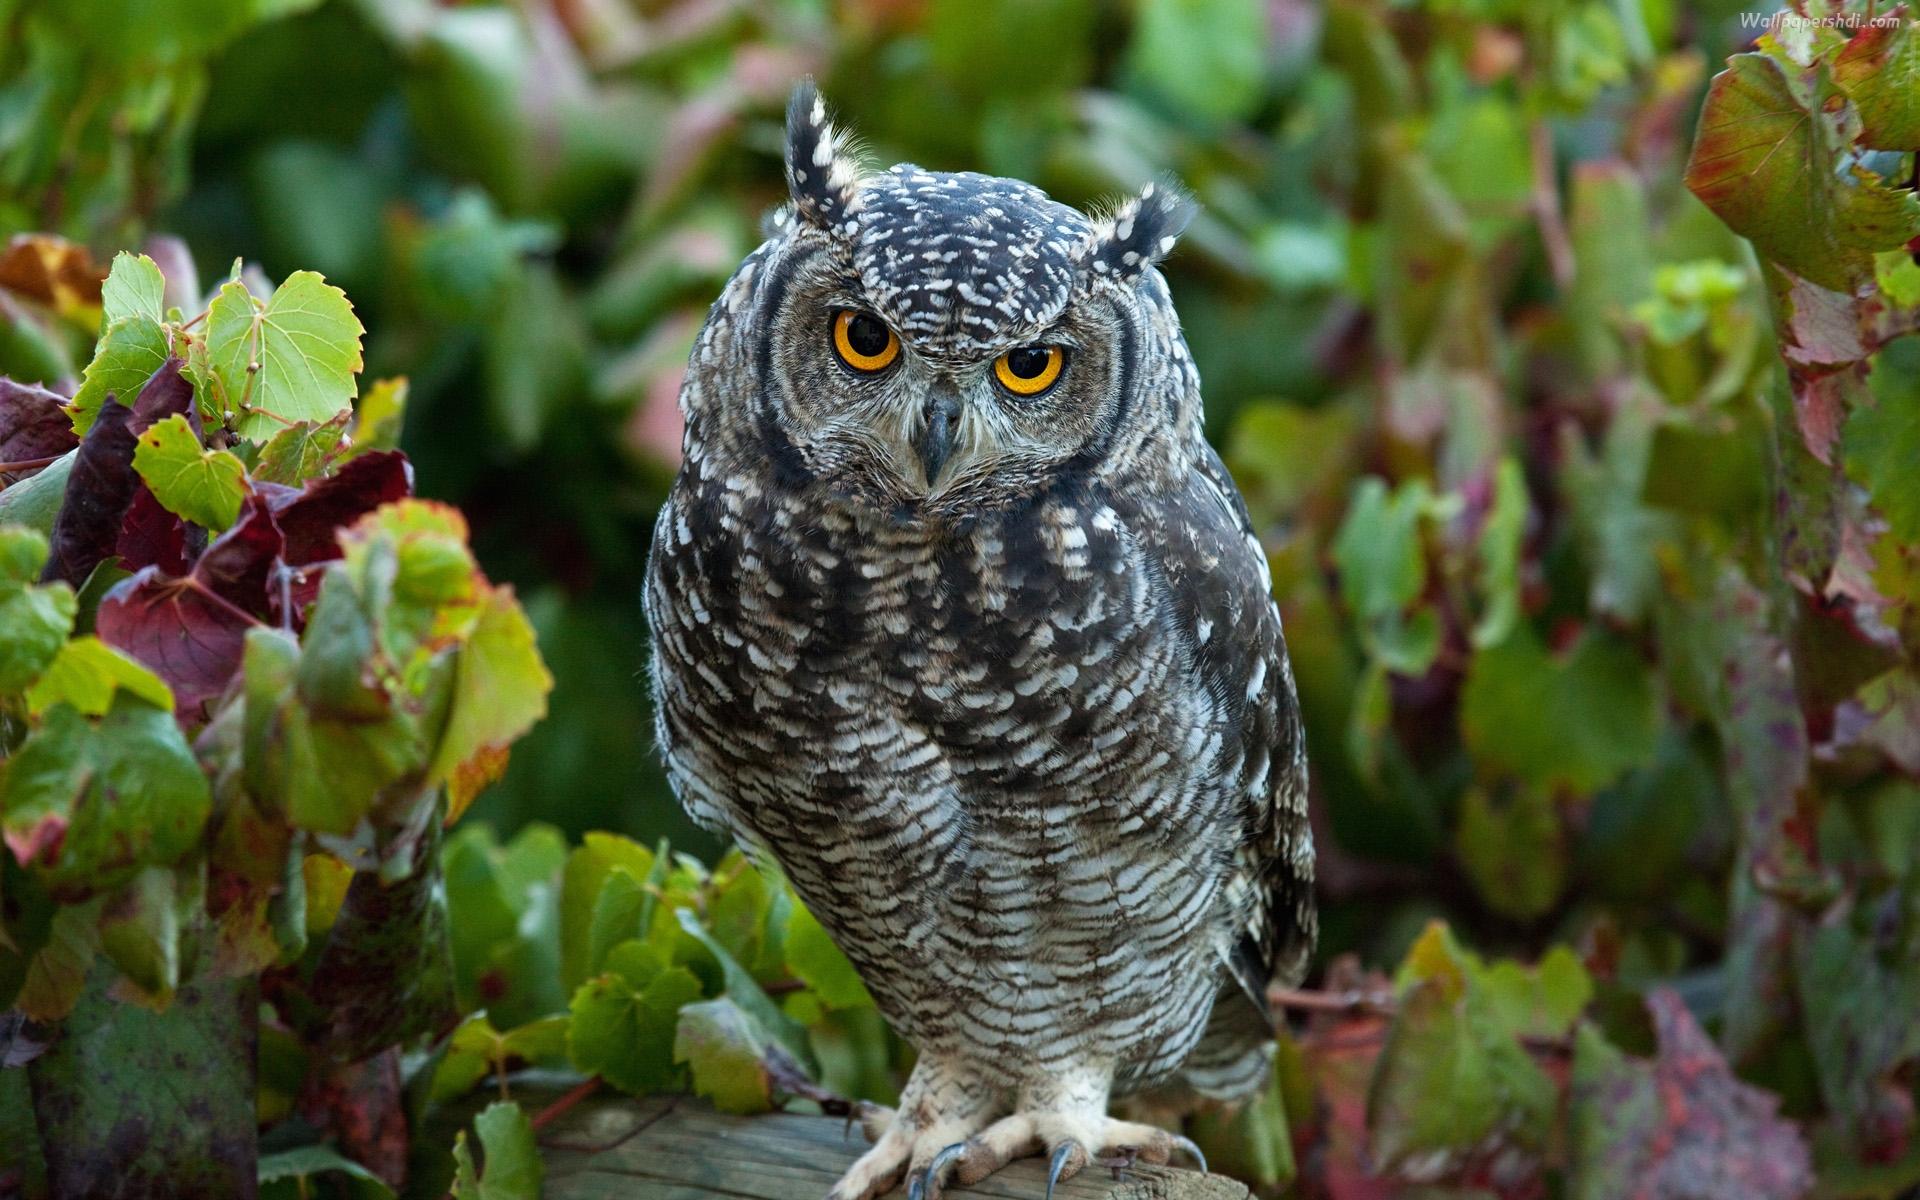 Desktop hd owl wallpapers download Download 3d HD colour design 1920x1200